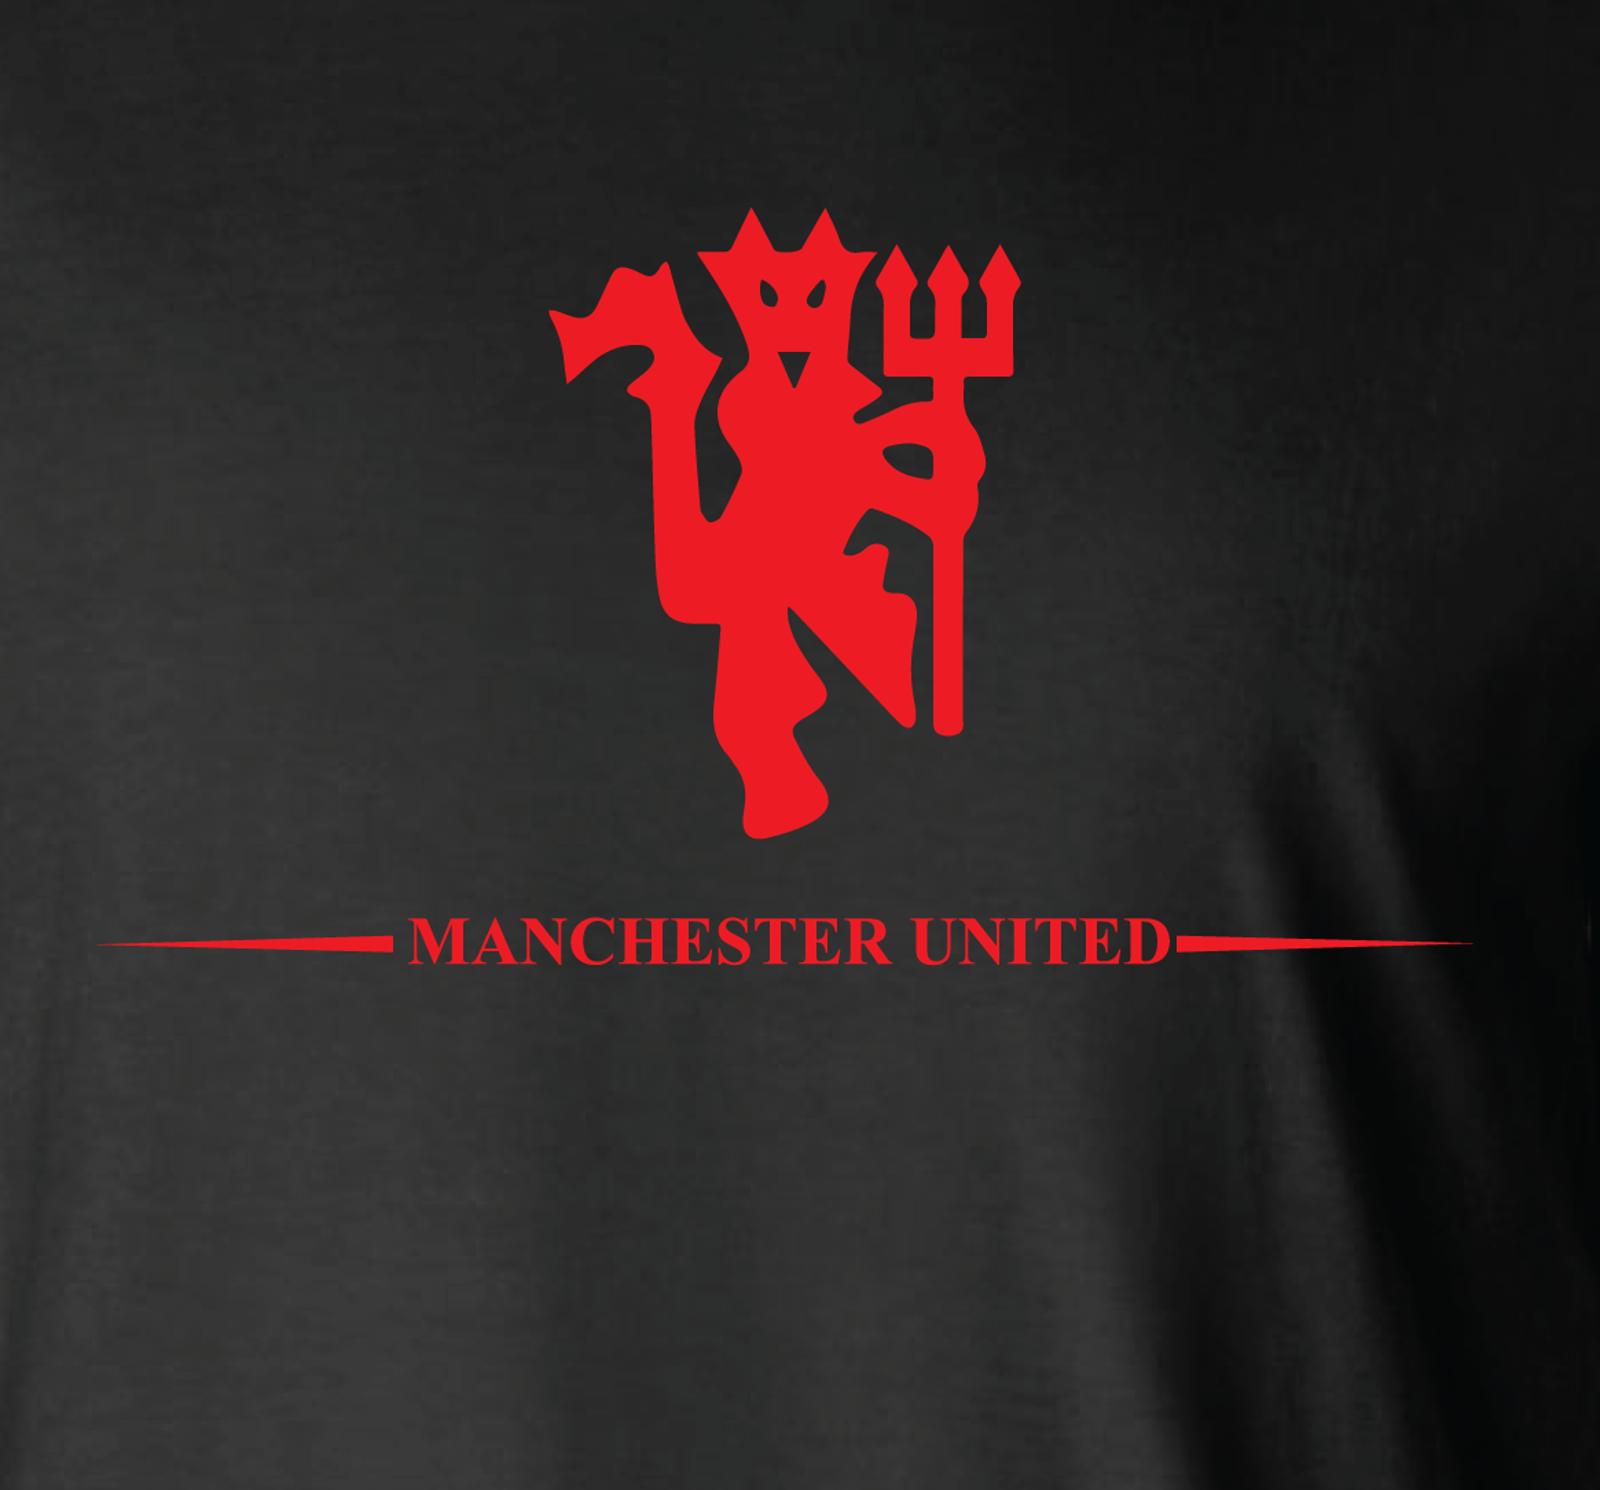 286ccb15 Manchester United, Hoodie, Long-Sleeved, T-Shirt, Crew Sweatshirt,